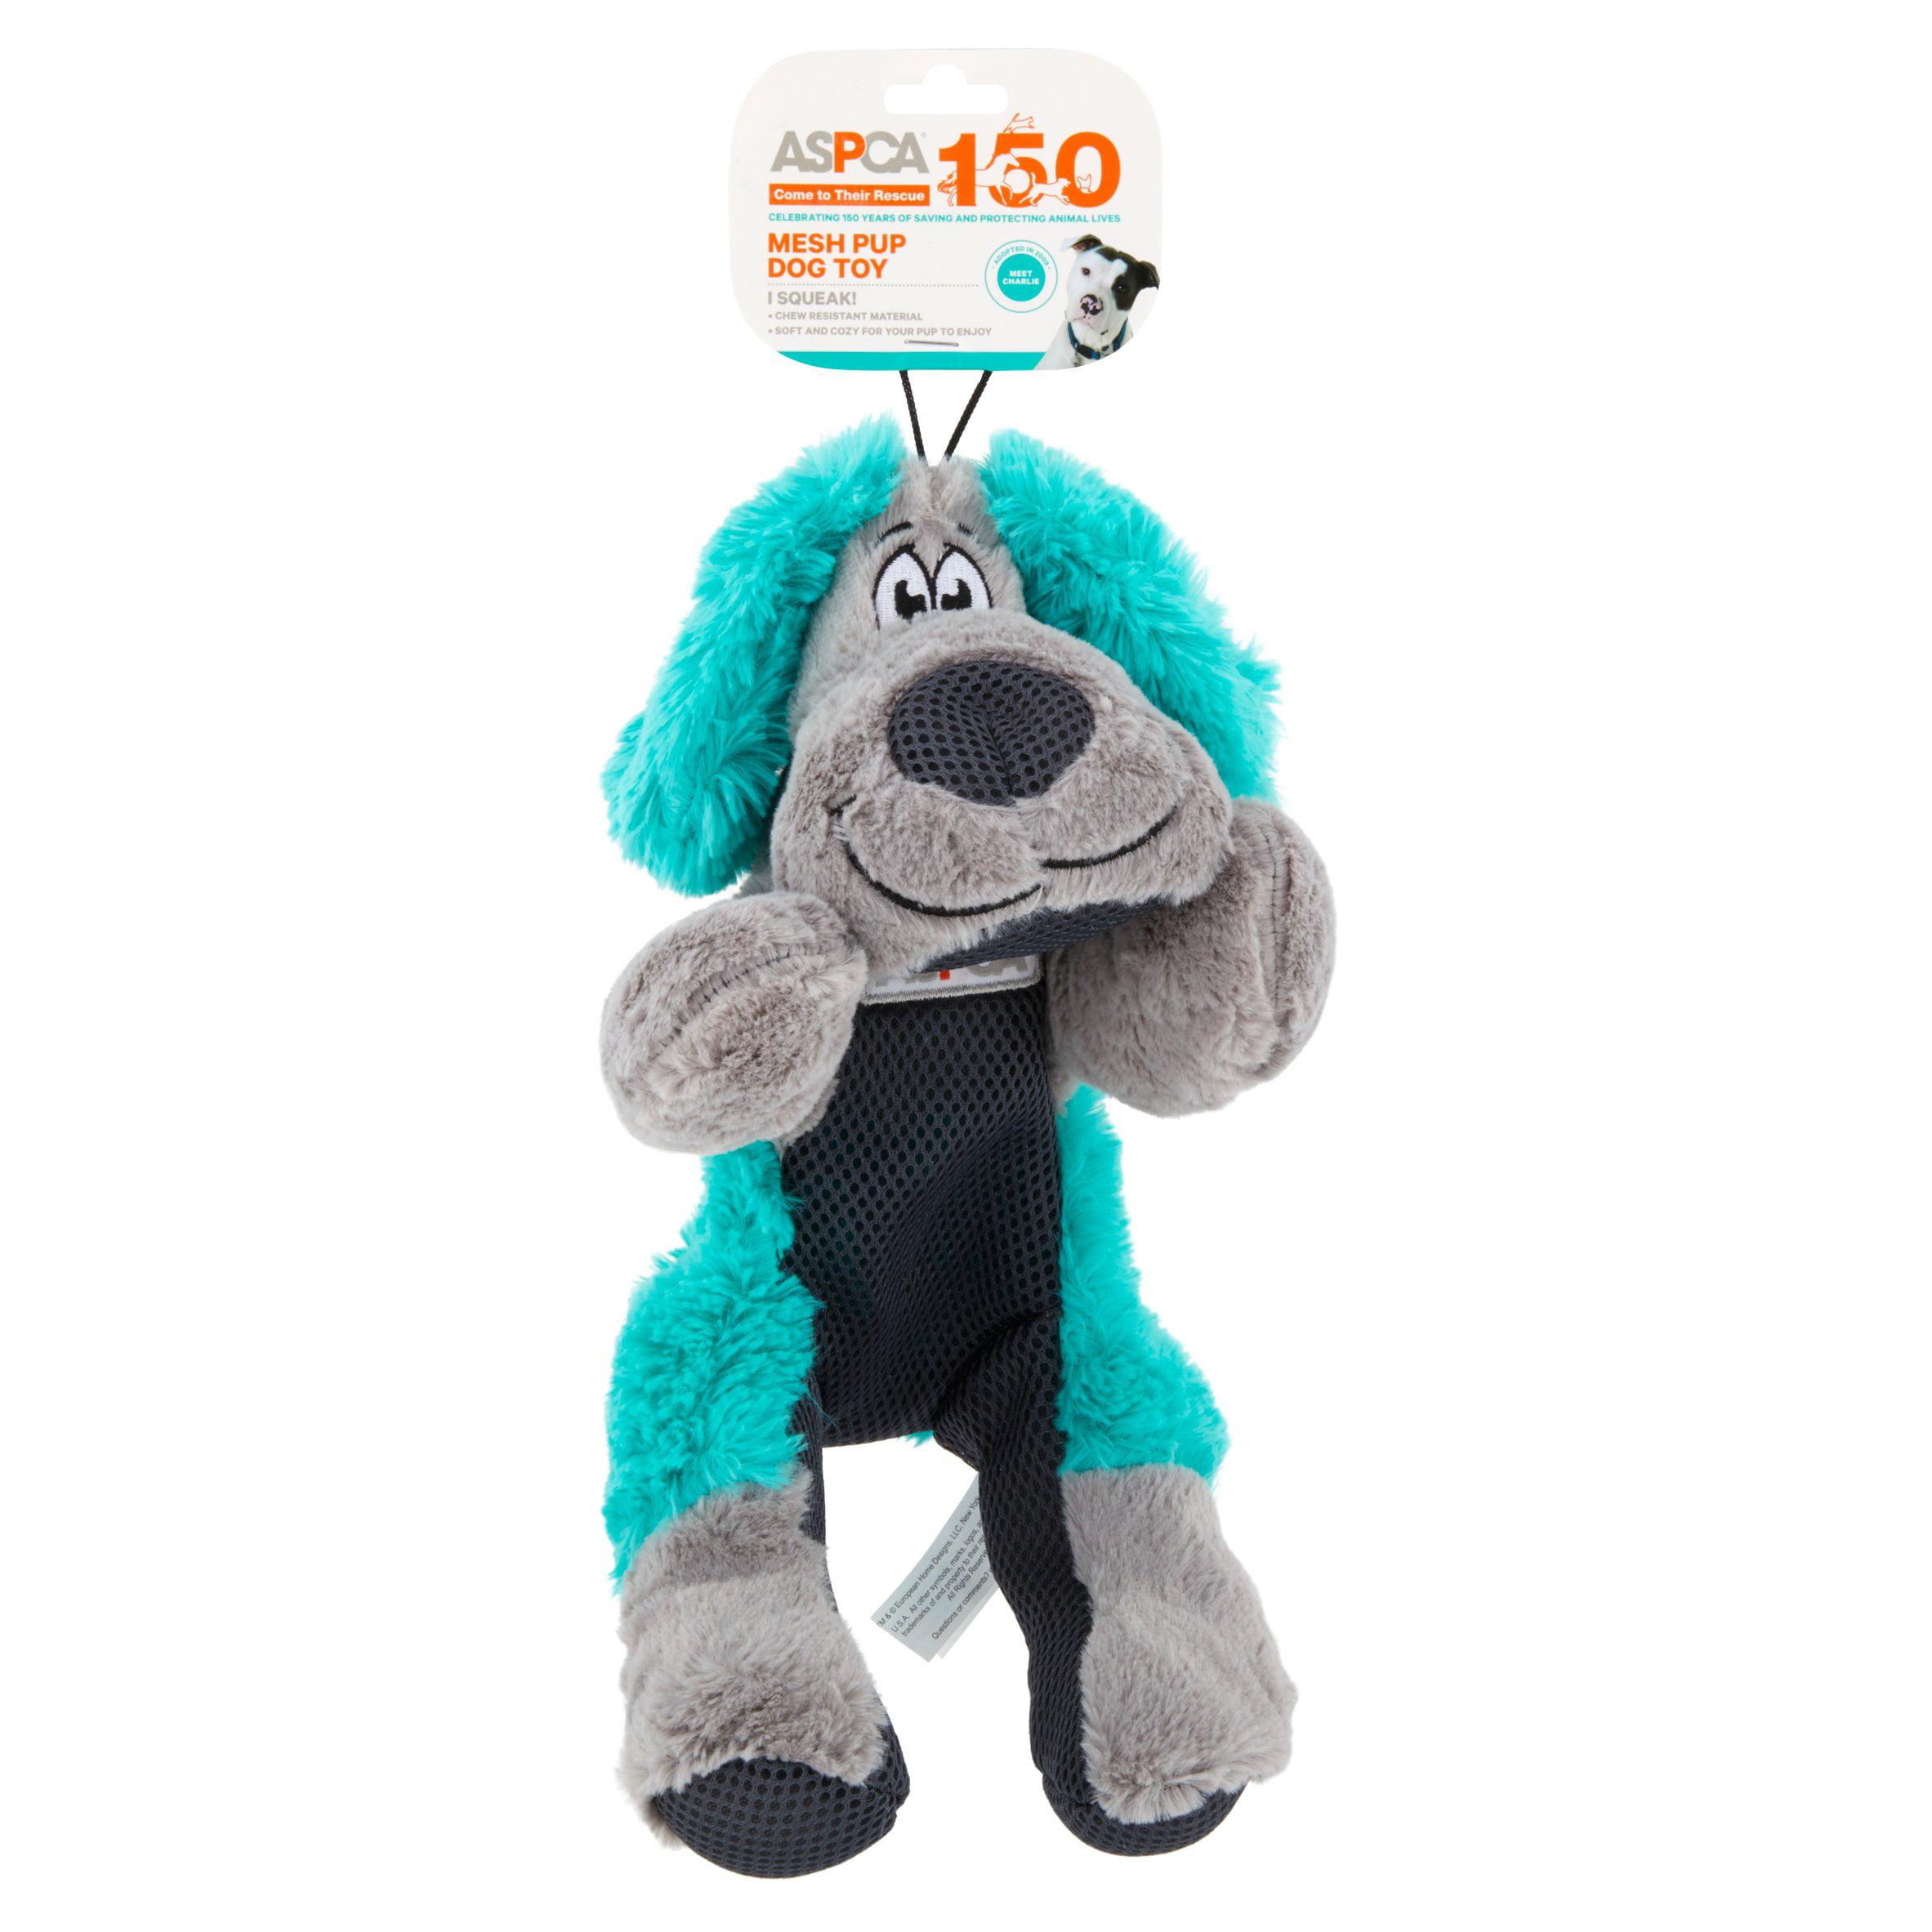 ASPCA Mesh Pup Dog Toy